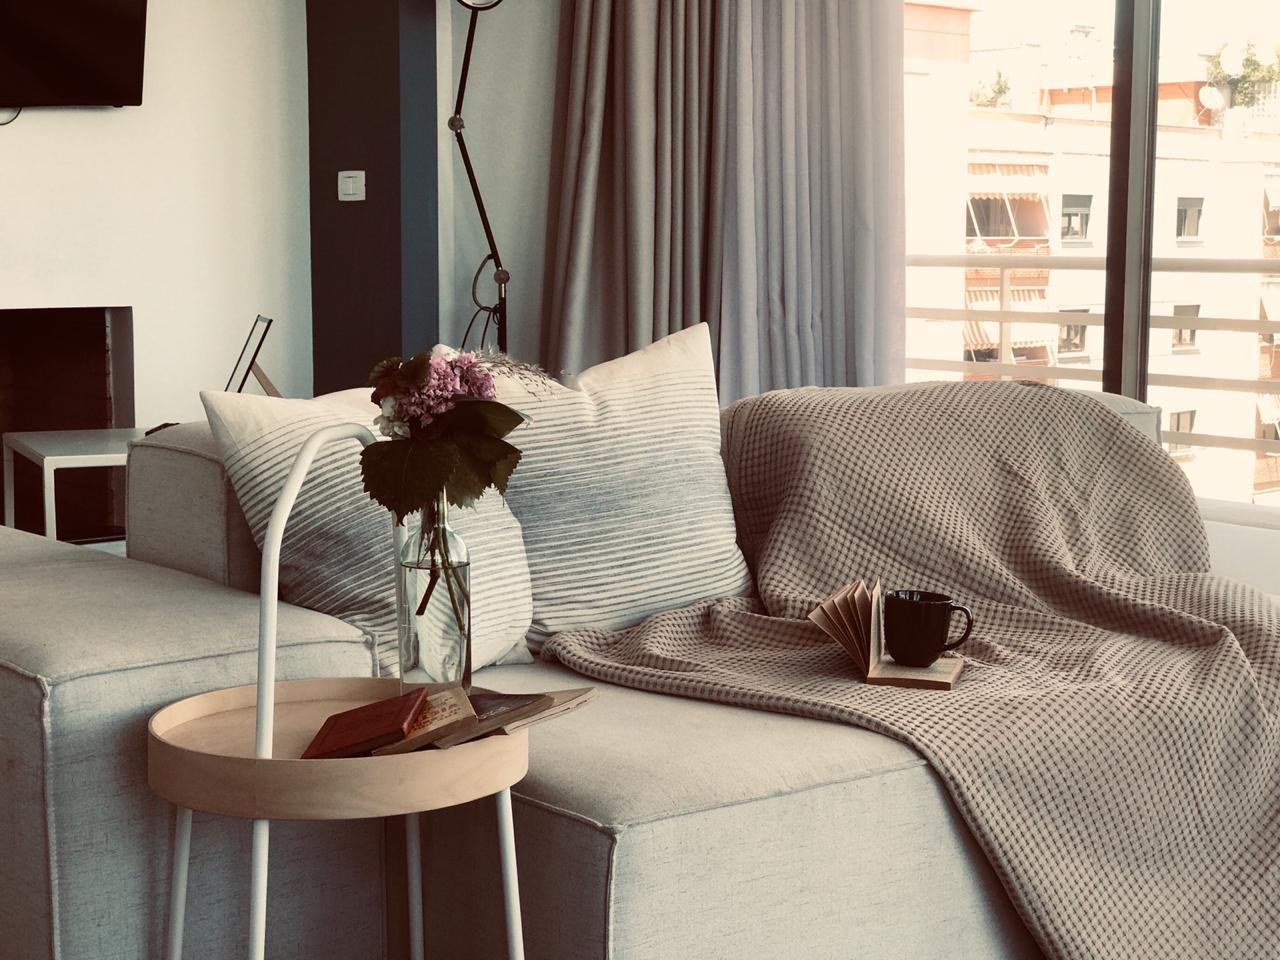 Apartamente me qira ditore prane sheshit Skenderbej